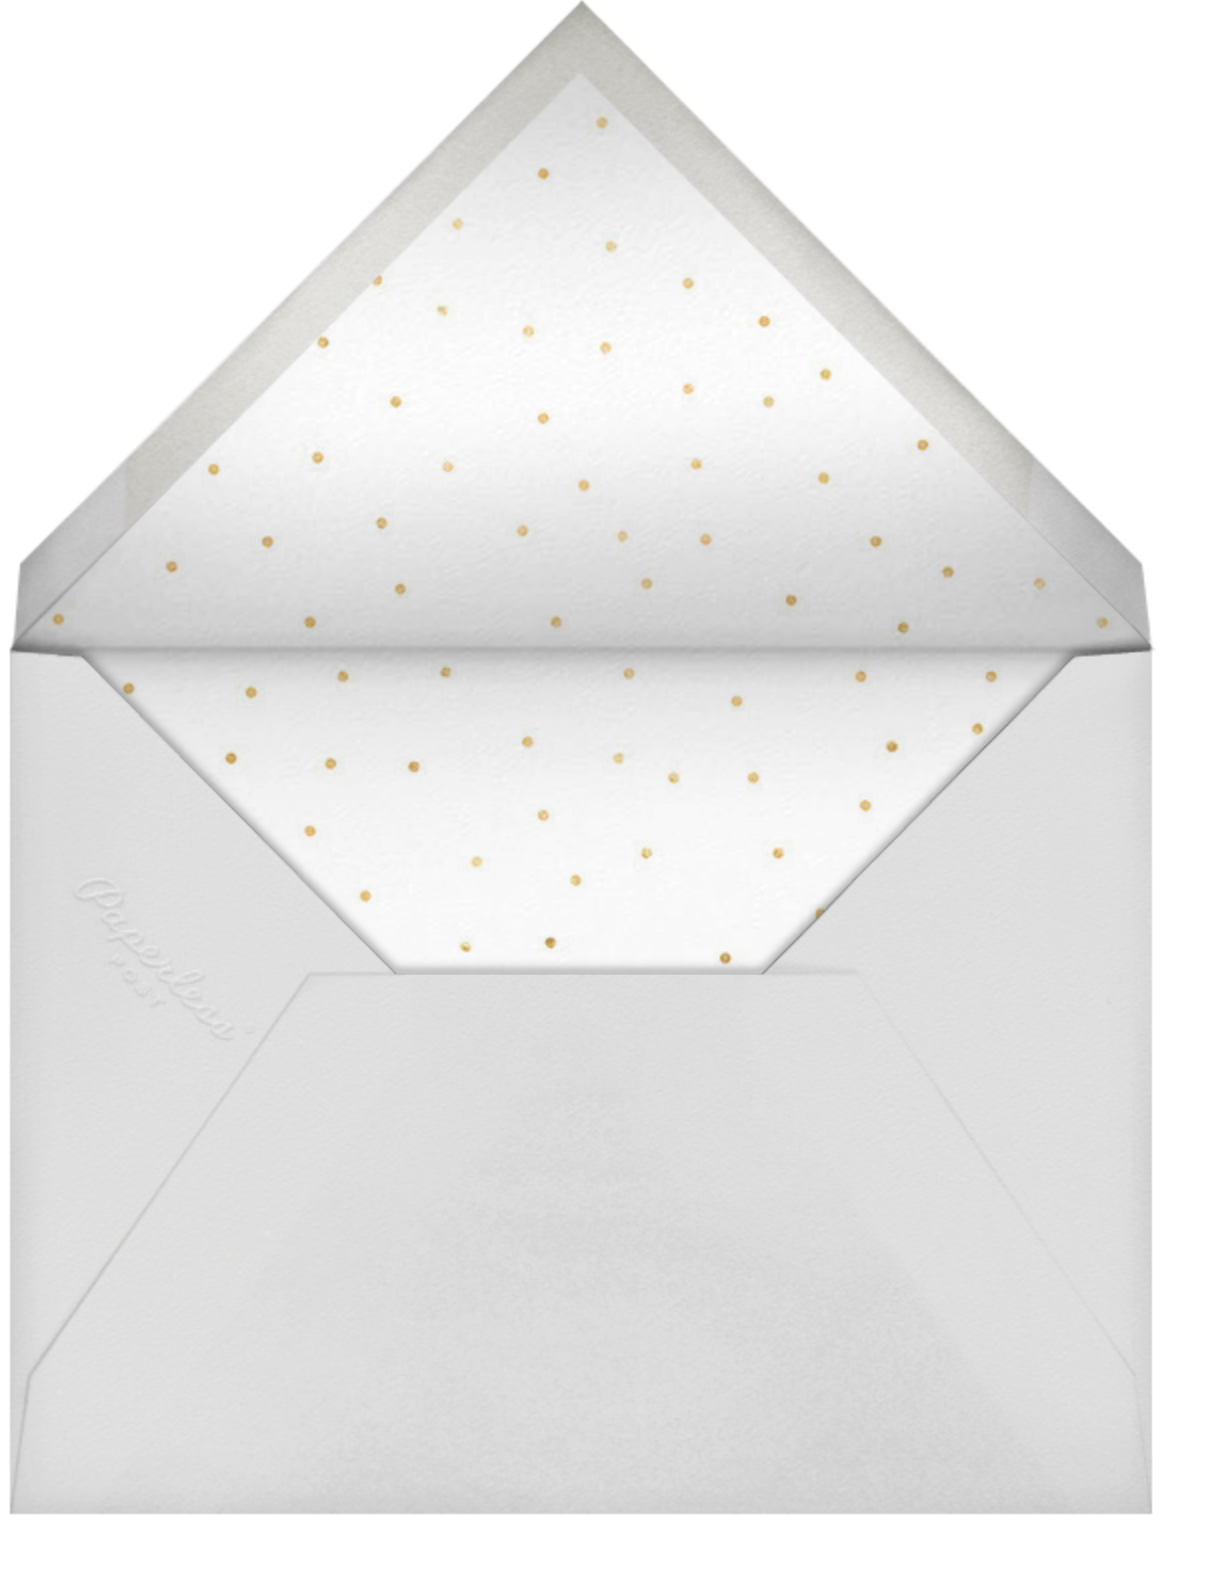 Firework - Satin Gold - Paperless Post - New Year's Eve - envelope back